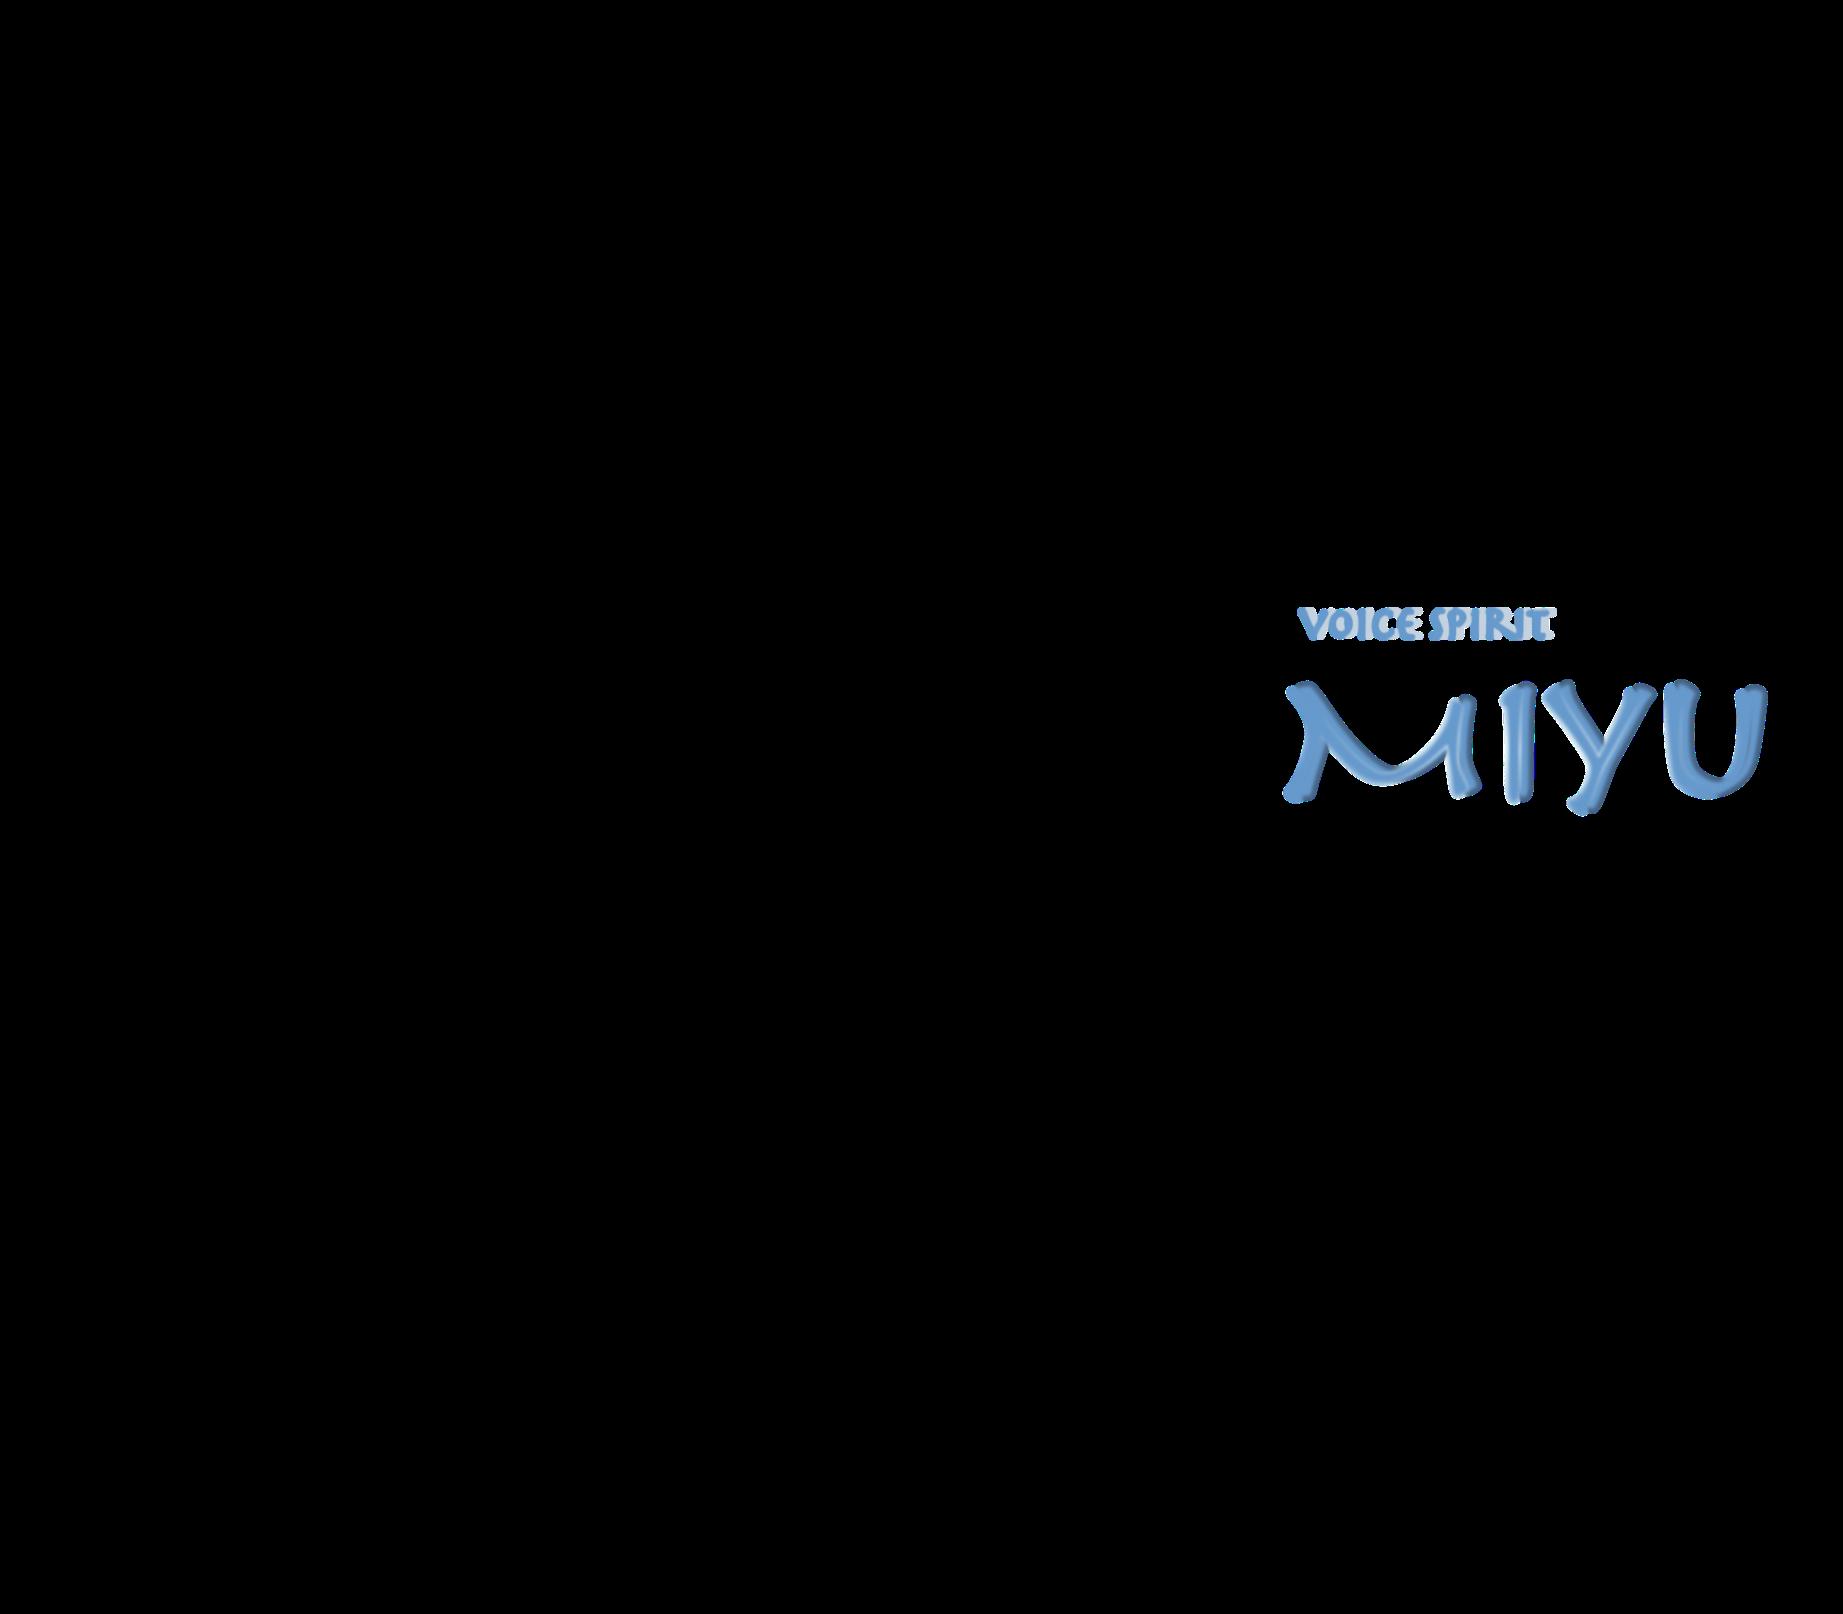 Literally Miyu